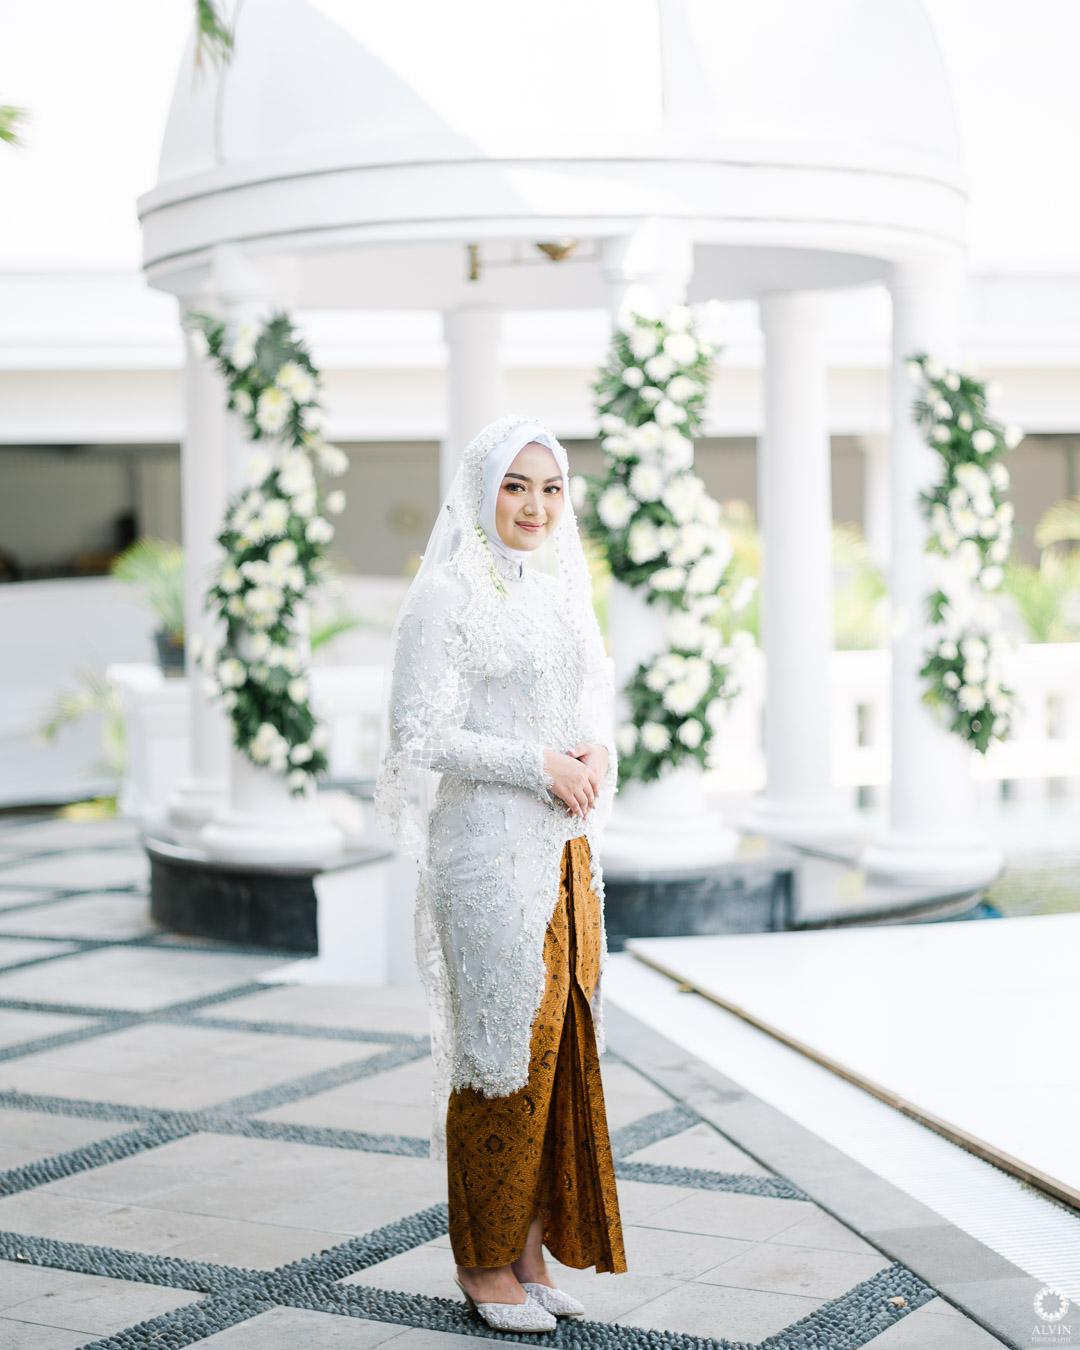 DSCF1434 : Bella & Fahmi Wedding